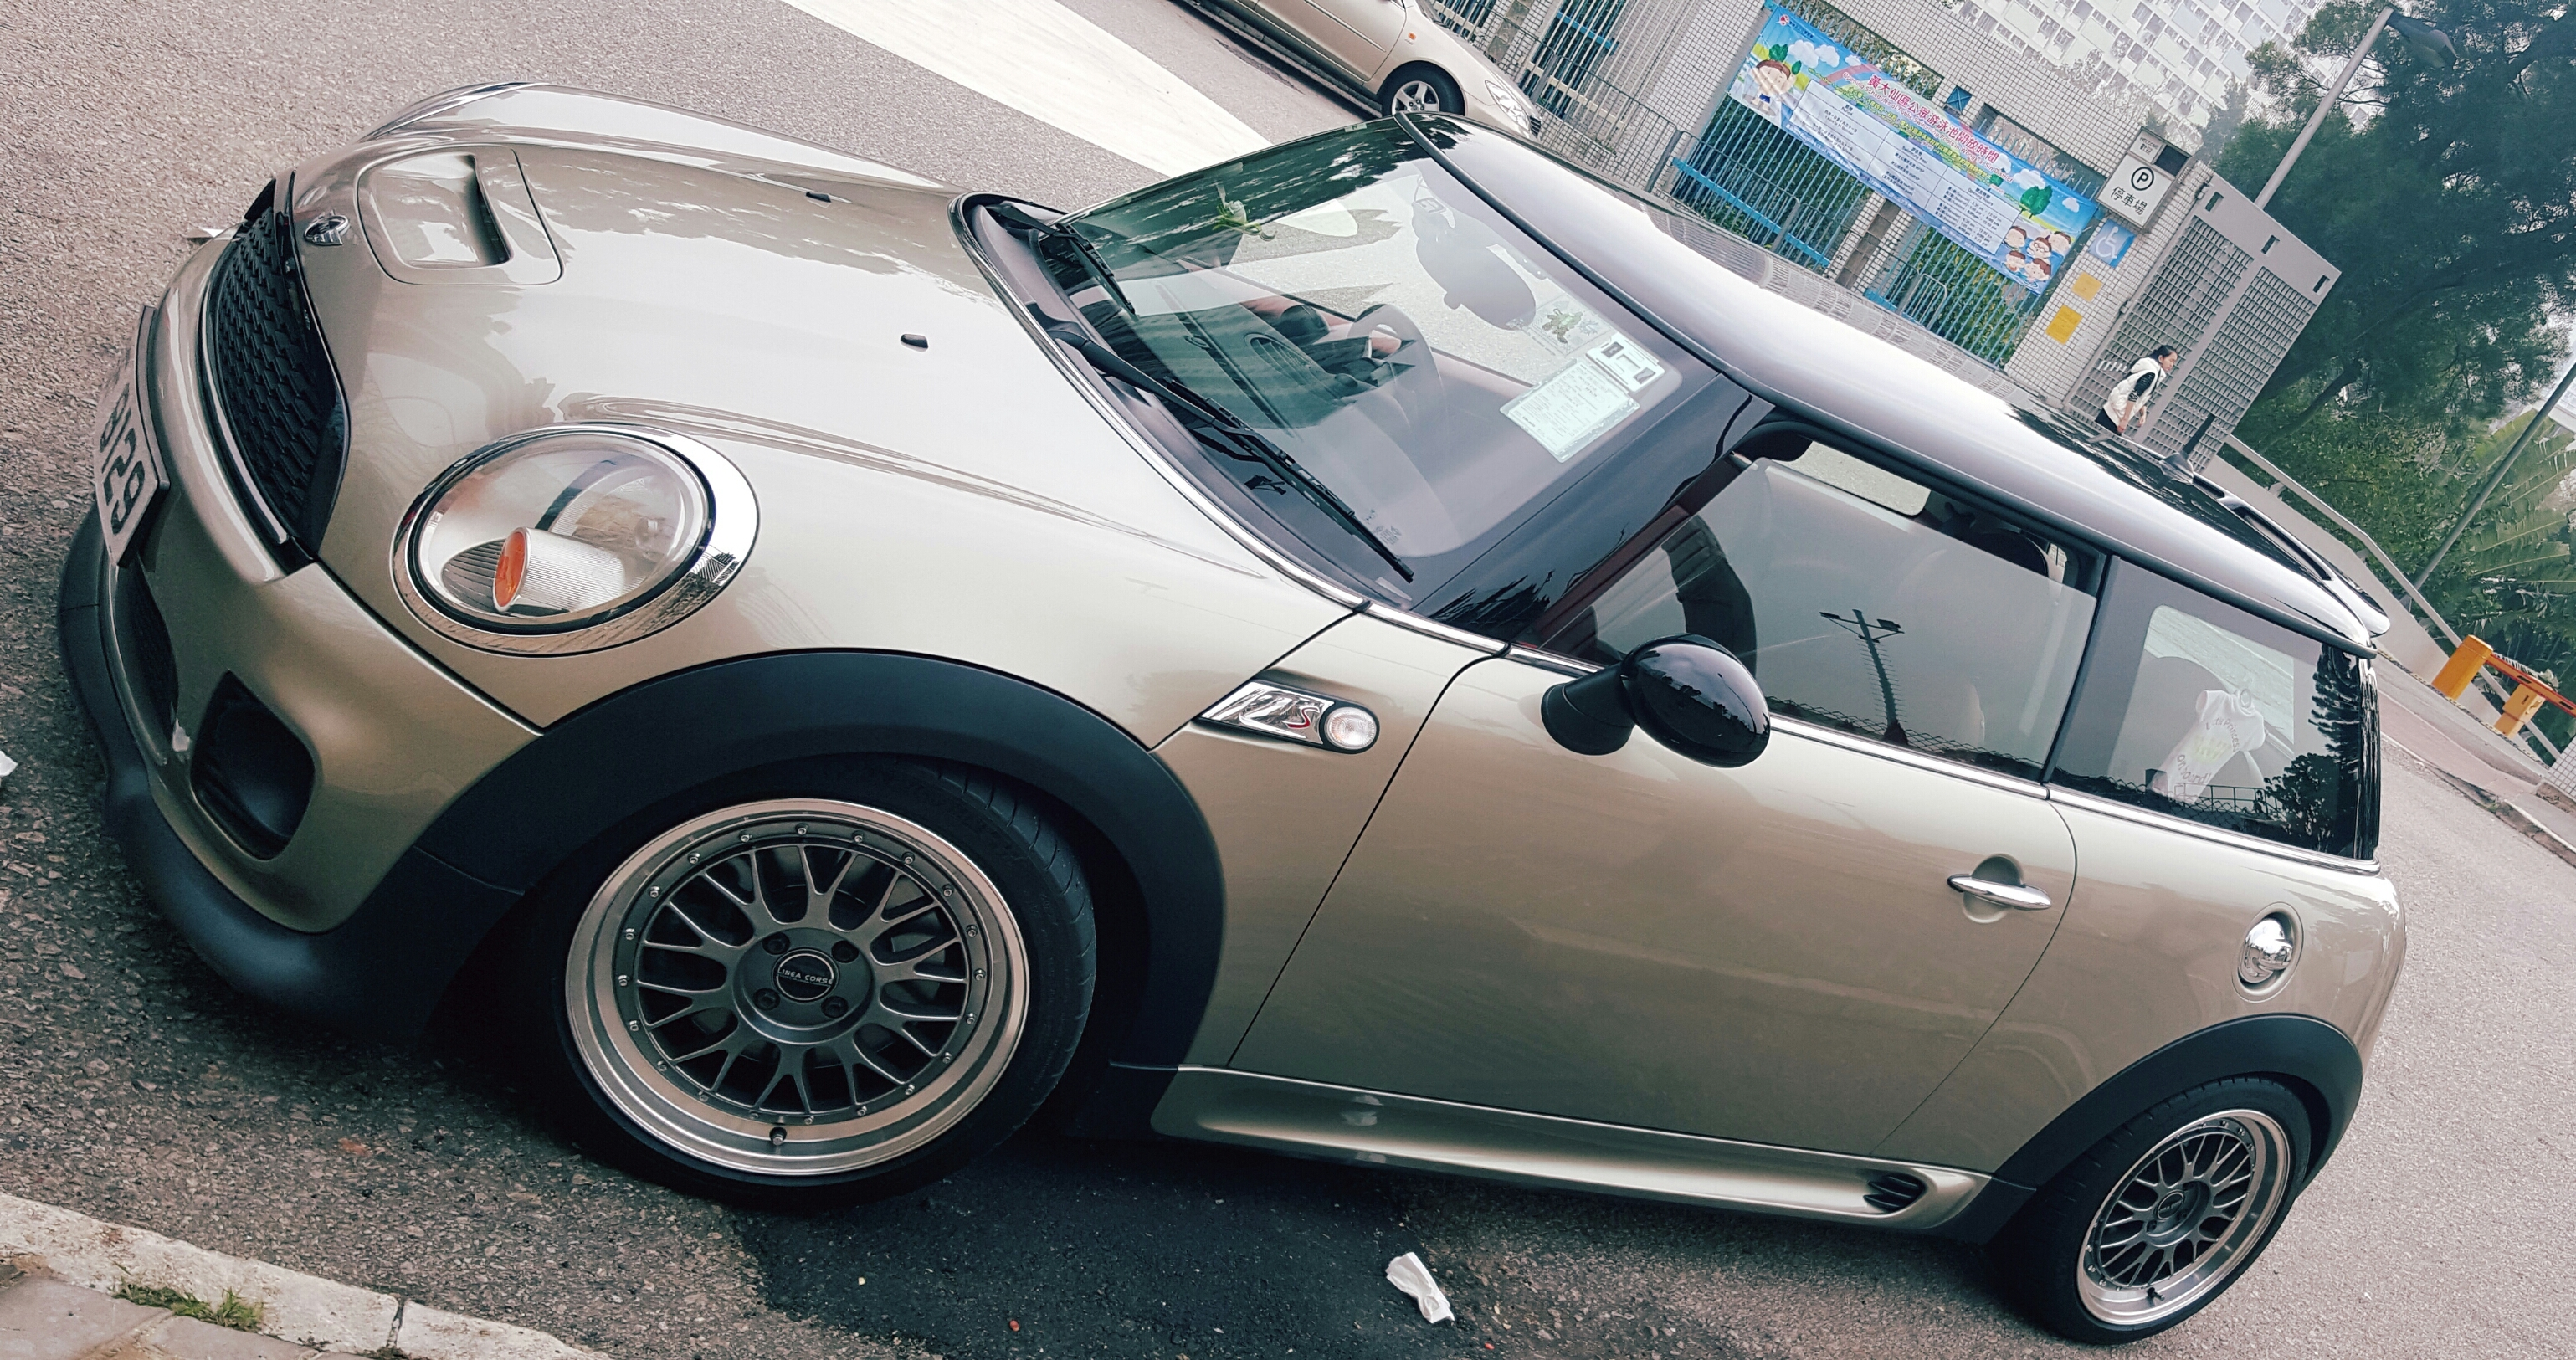 Mini Cooper S ECU Flashed in Hong Kong